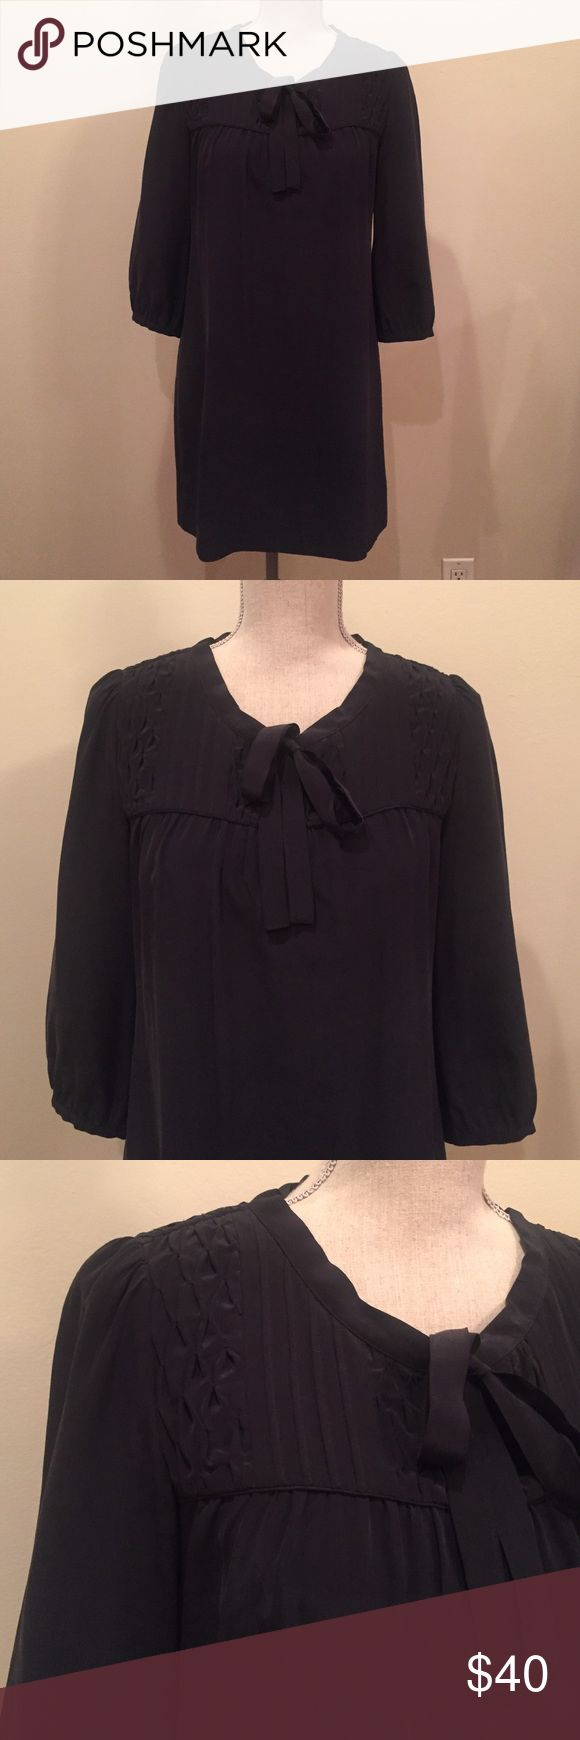 "Joie dress💐 MARKDOWN! Joie black 100% silk shift dress. 3/4 sleeve and tie front. Length 32""  sleeve 18"" shoulders 14"" Joie Dresses Midi"